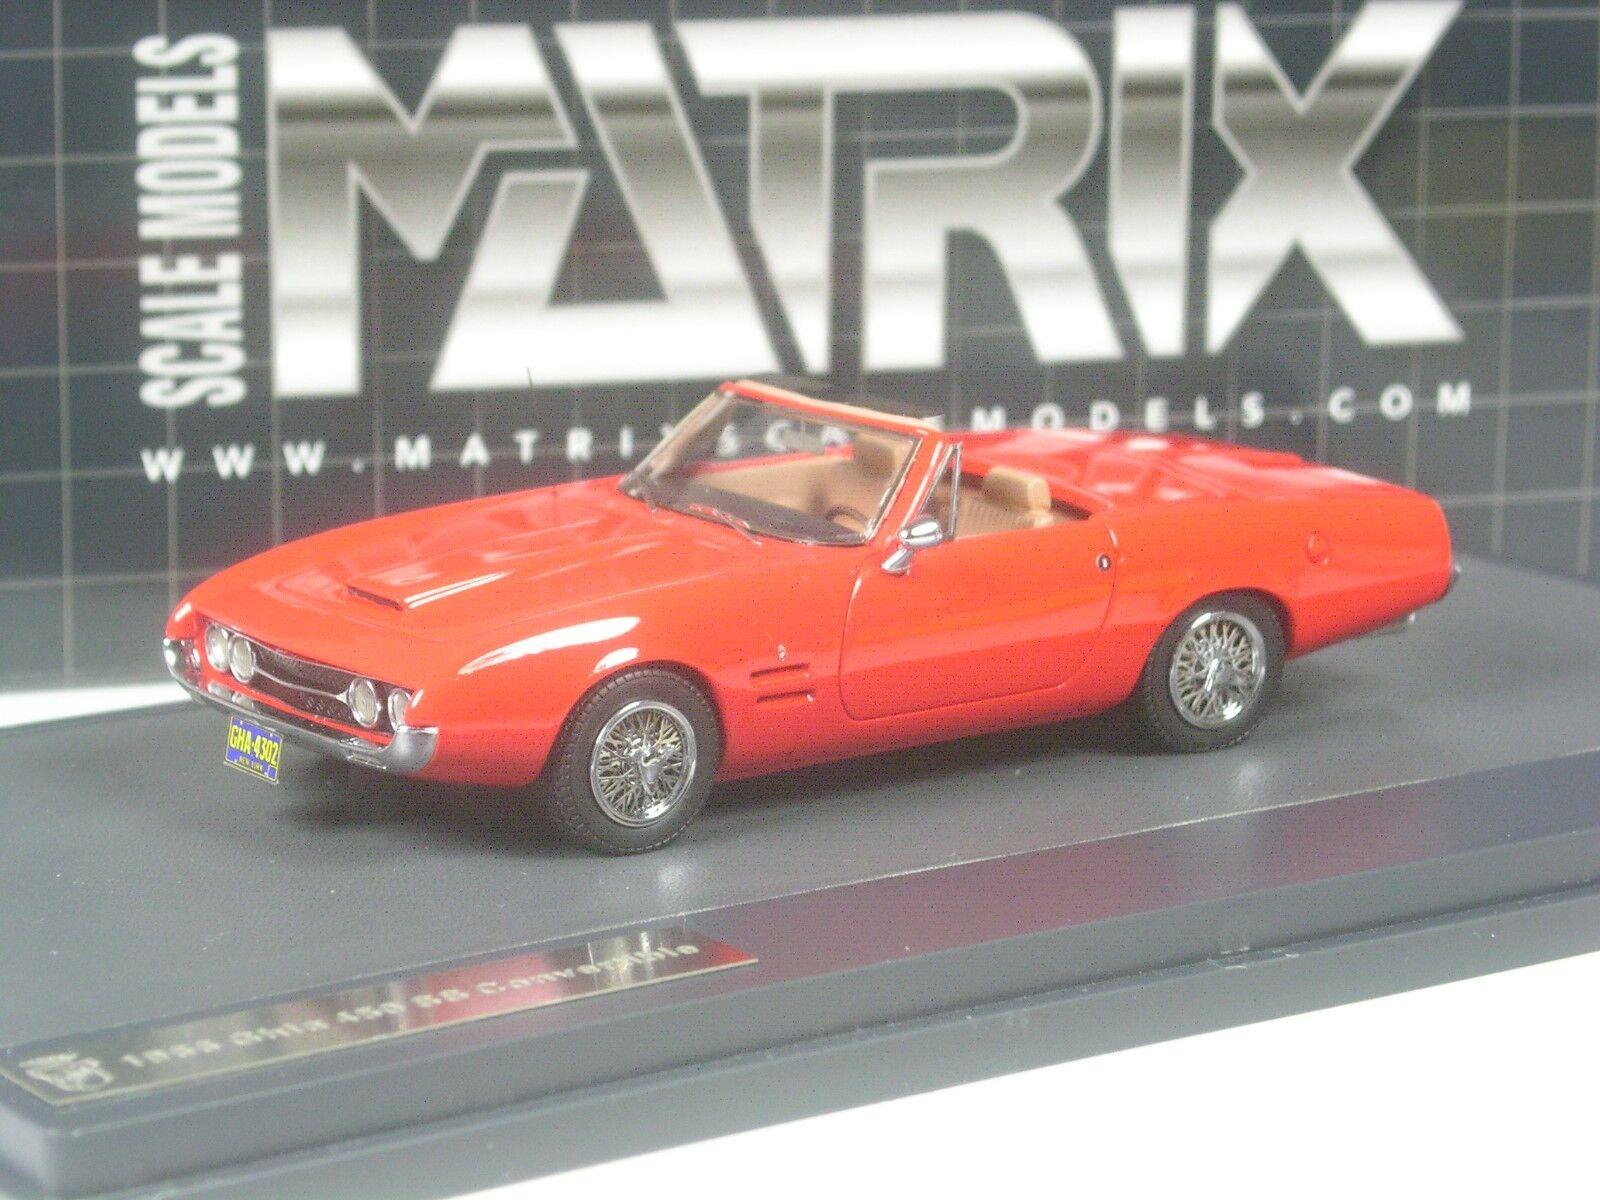 Clase  matriz Ghia 450 SS converdeible 1966 rosso en 1 43 en OVP